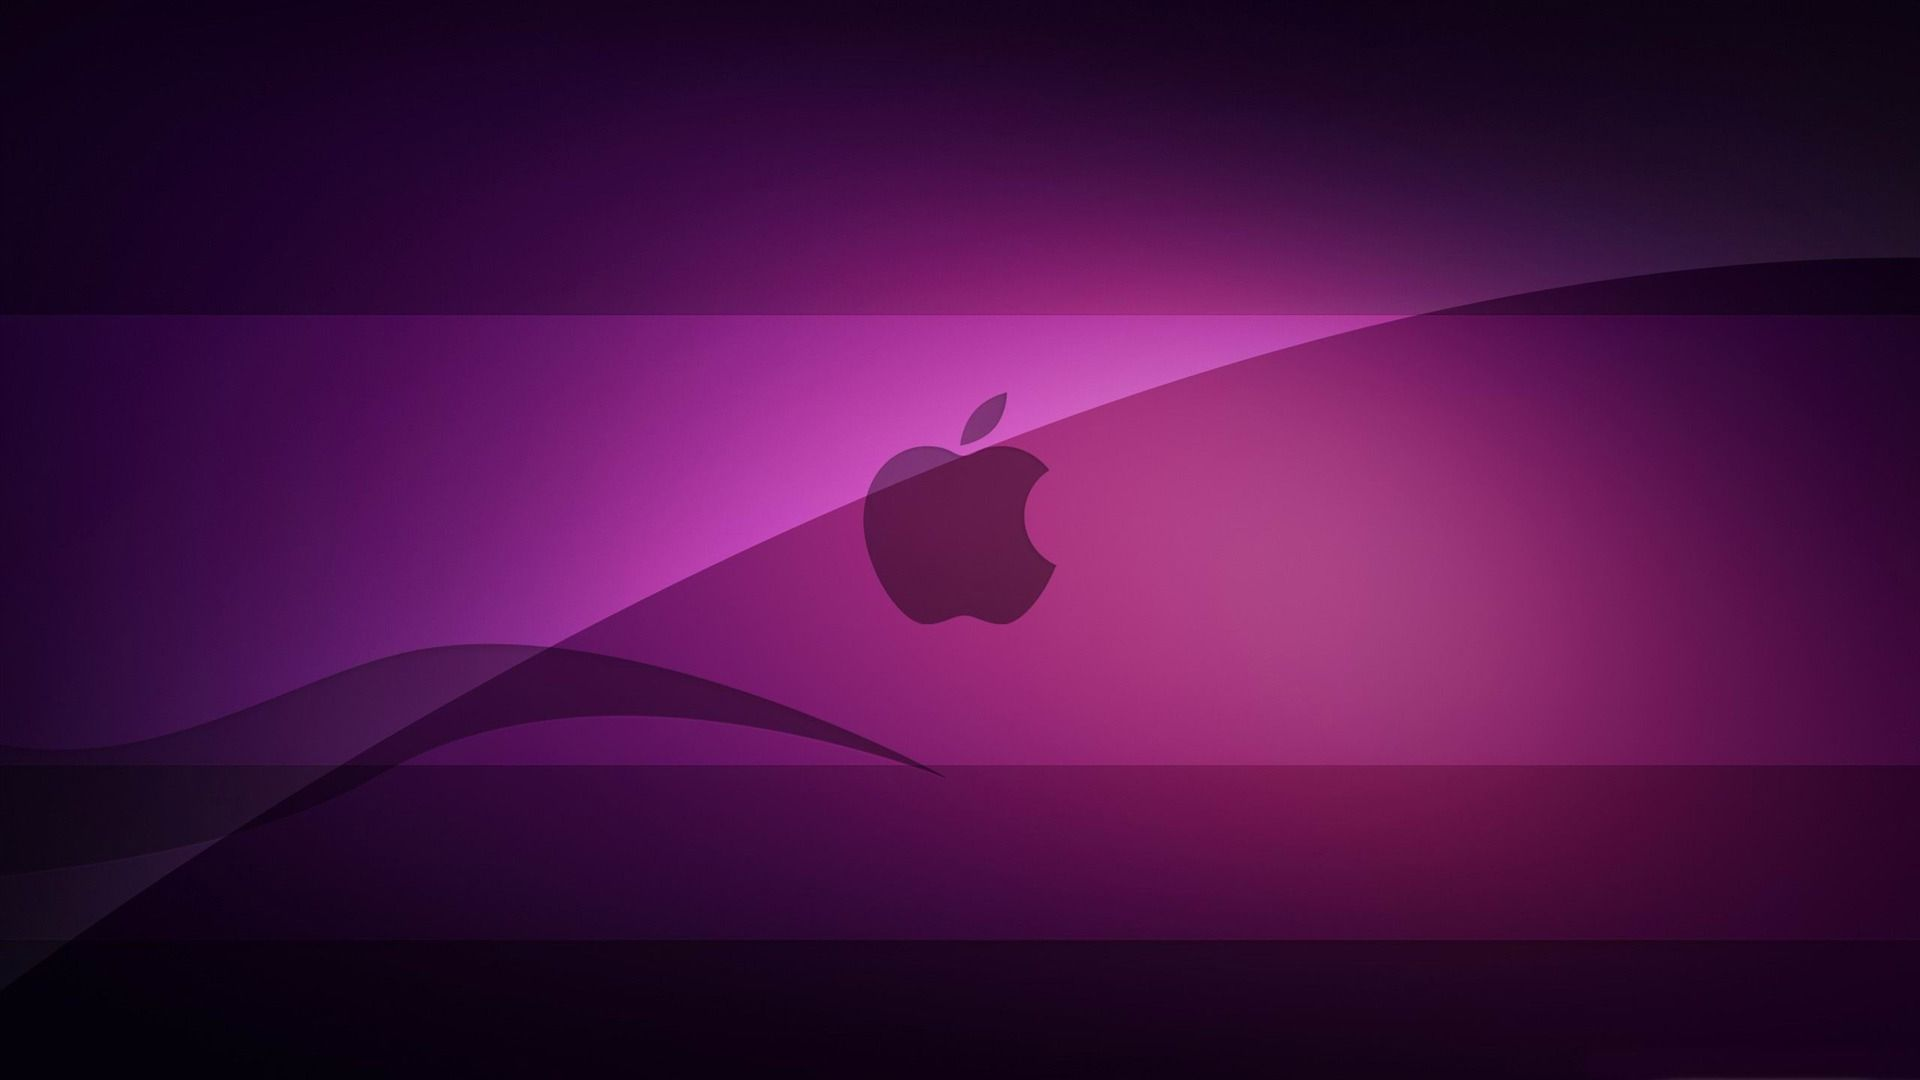 stunning and beautiful apple desktop wallpapers 1600×1000 apple